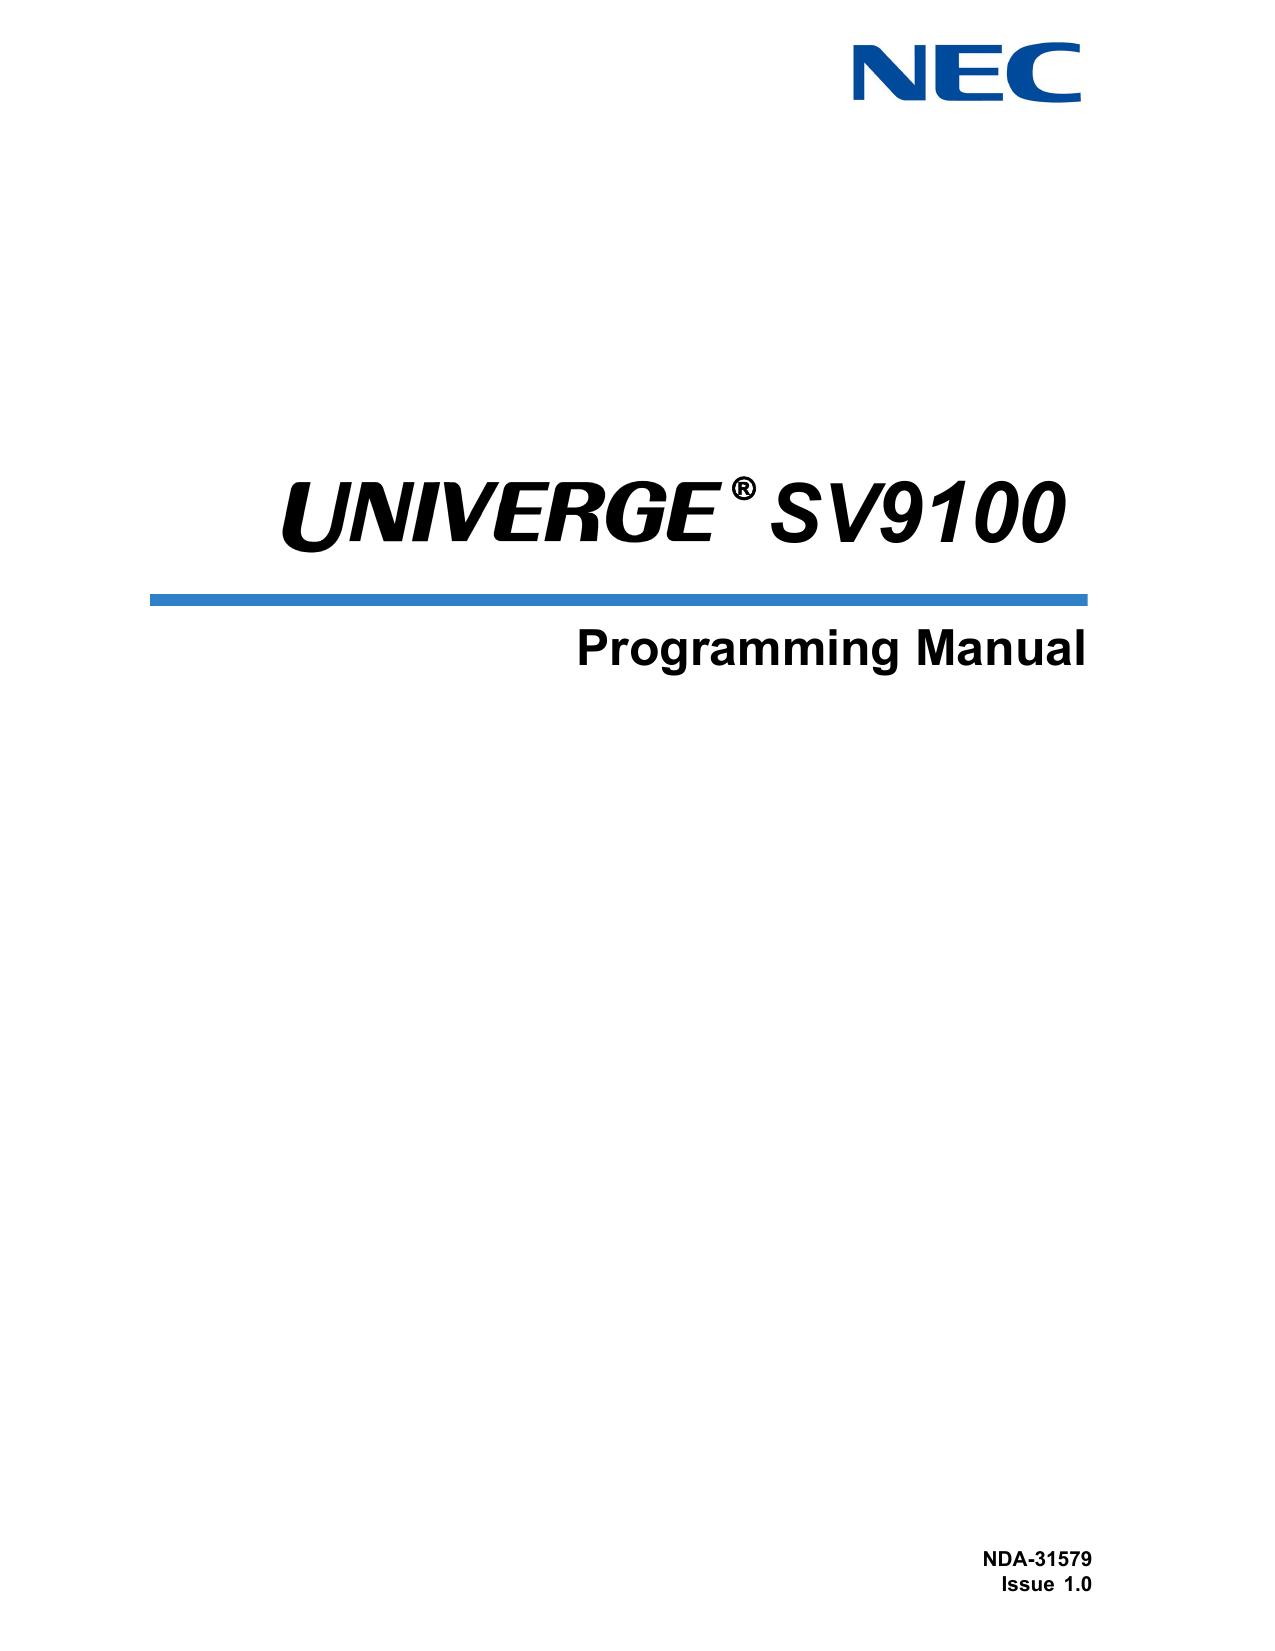 UNIVERGE SV9100 Programming Manual | manualzz com